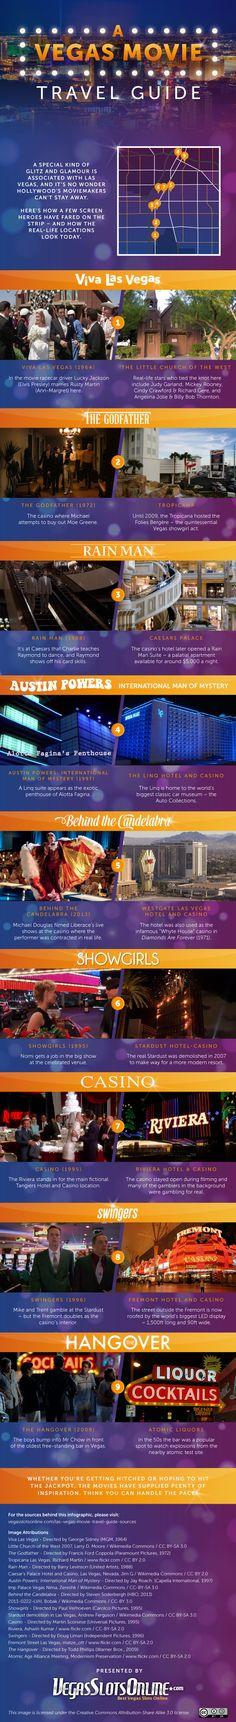 Las Vegas movie travel guide. Infographic by VegasSlotsOnline.com #LasVegas #TravelNevada